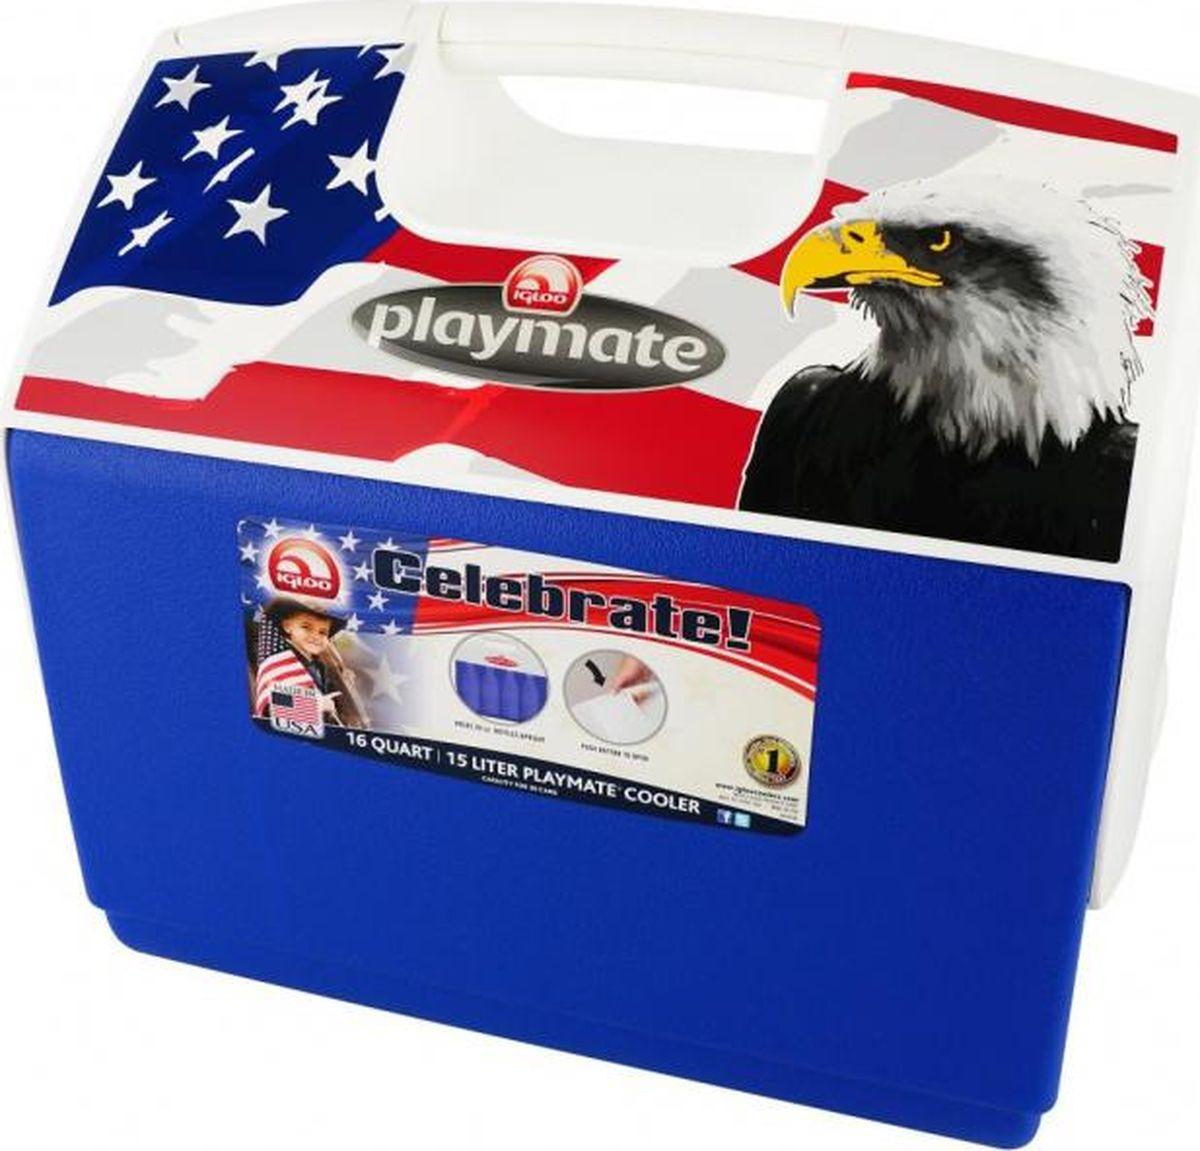 Изотермический контейнер Igloo Playmate, 00043860, белый, синий, красный, 40 х 26 х 38 см igloo изотермический контейнер igloo playmate pal jucetwh